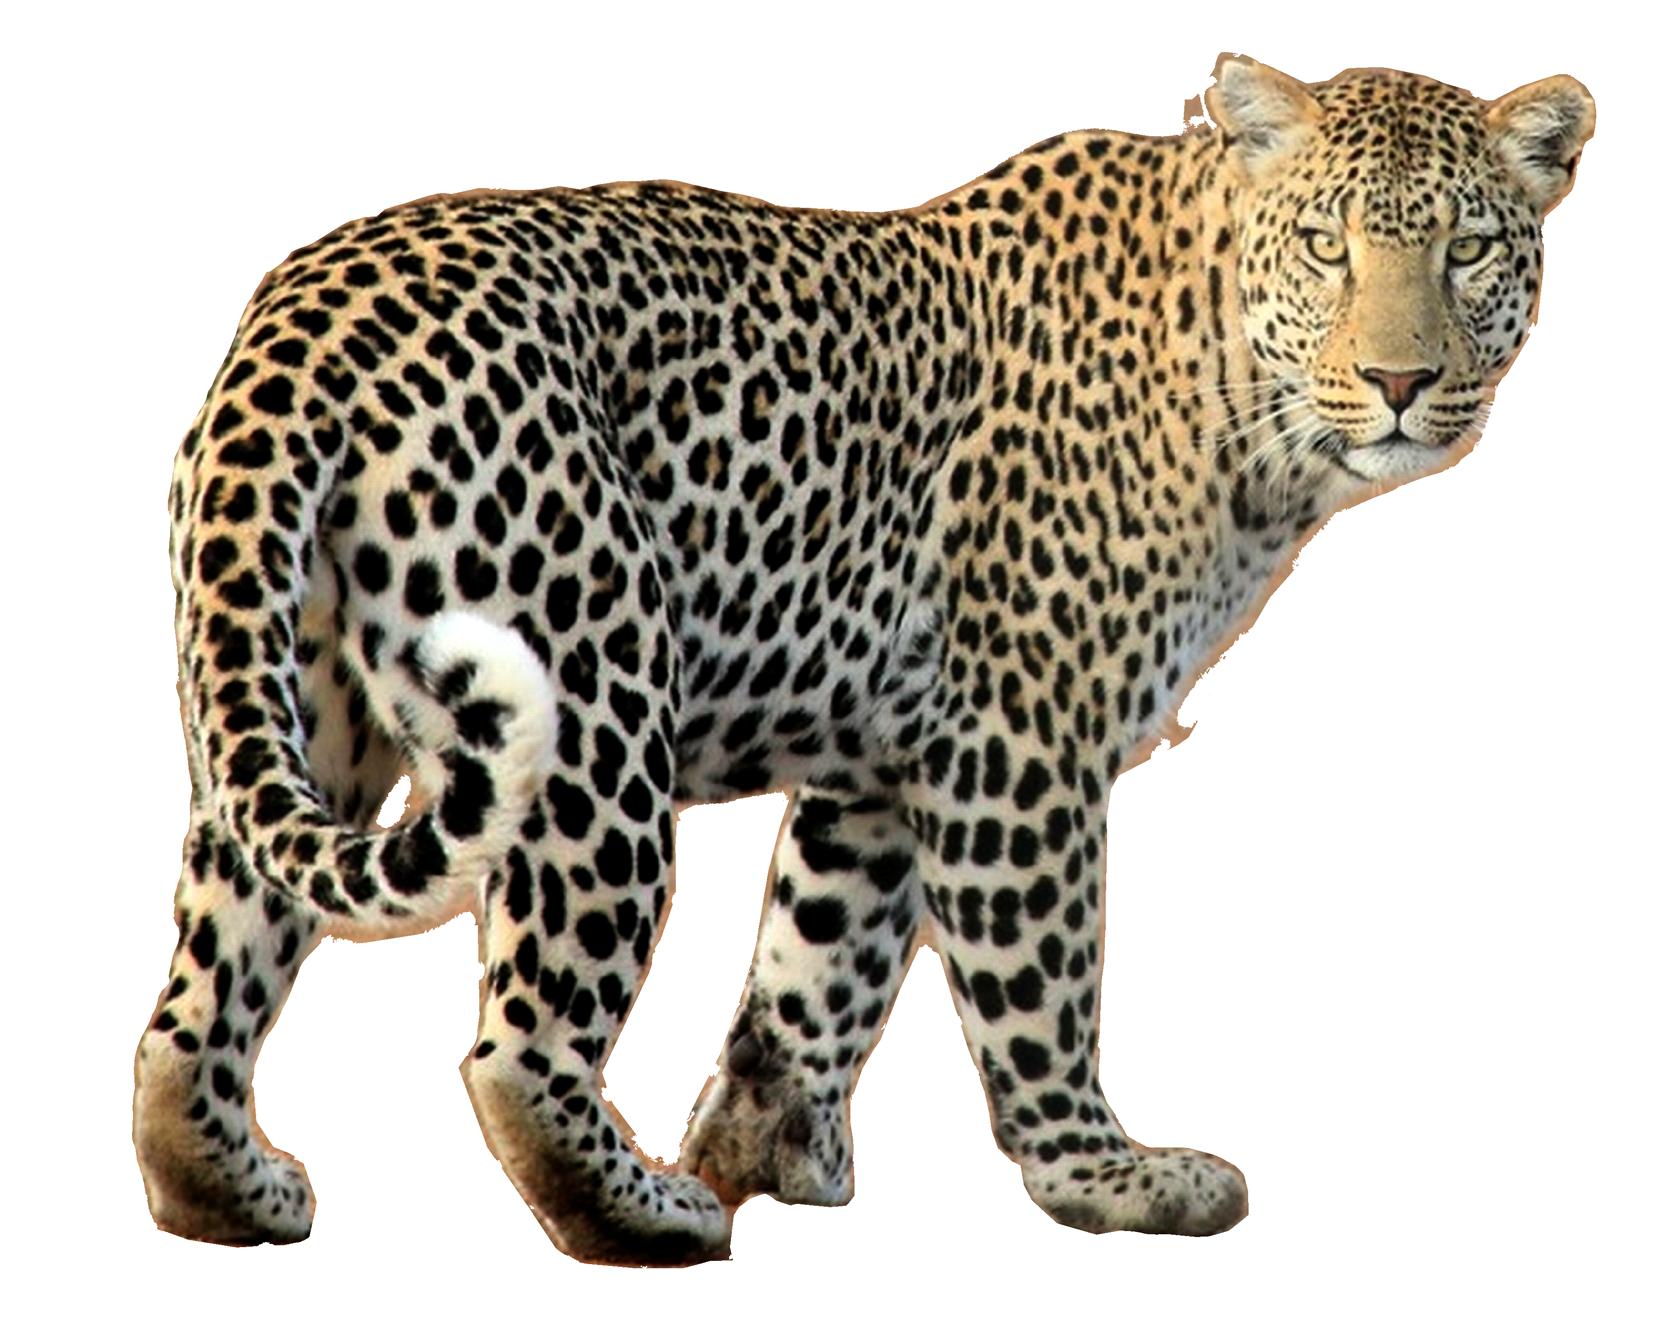 Leopard PNG Image.